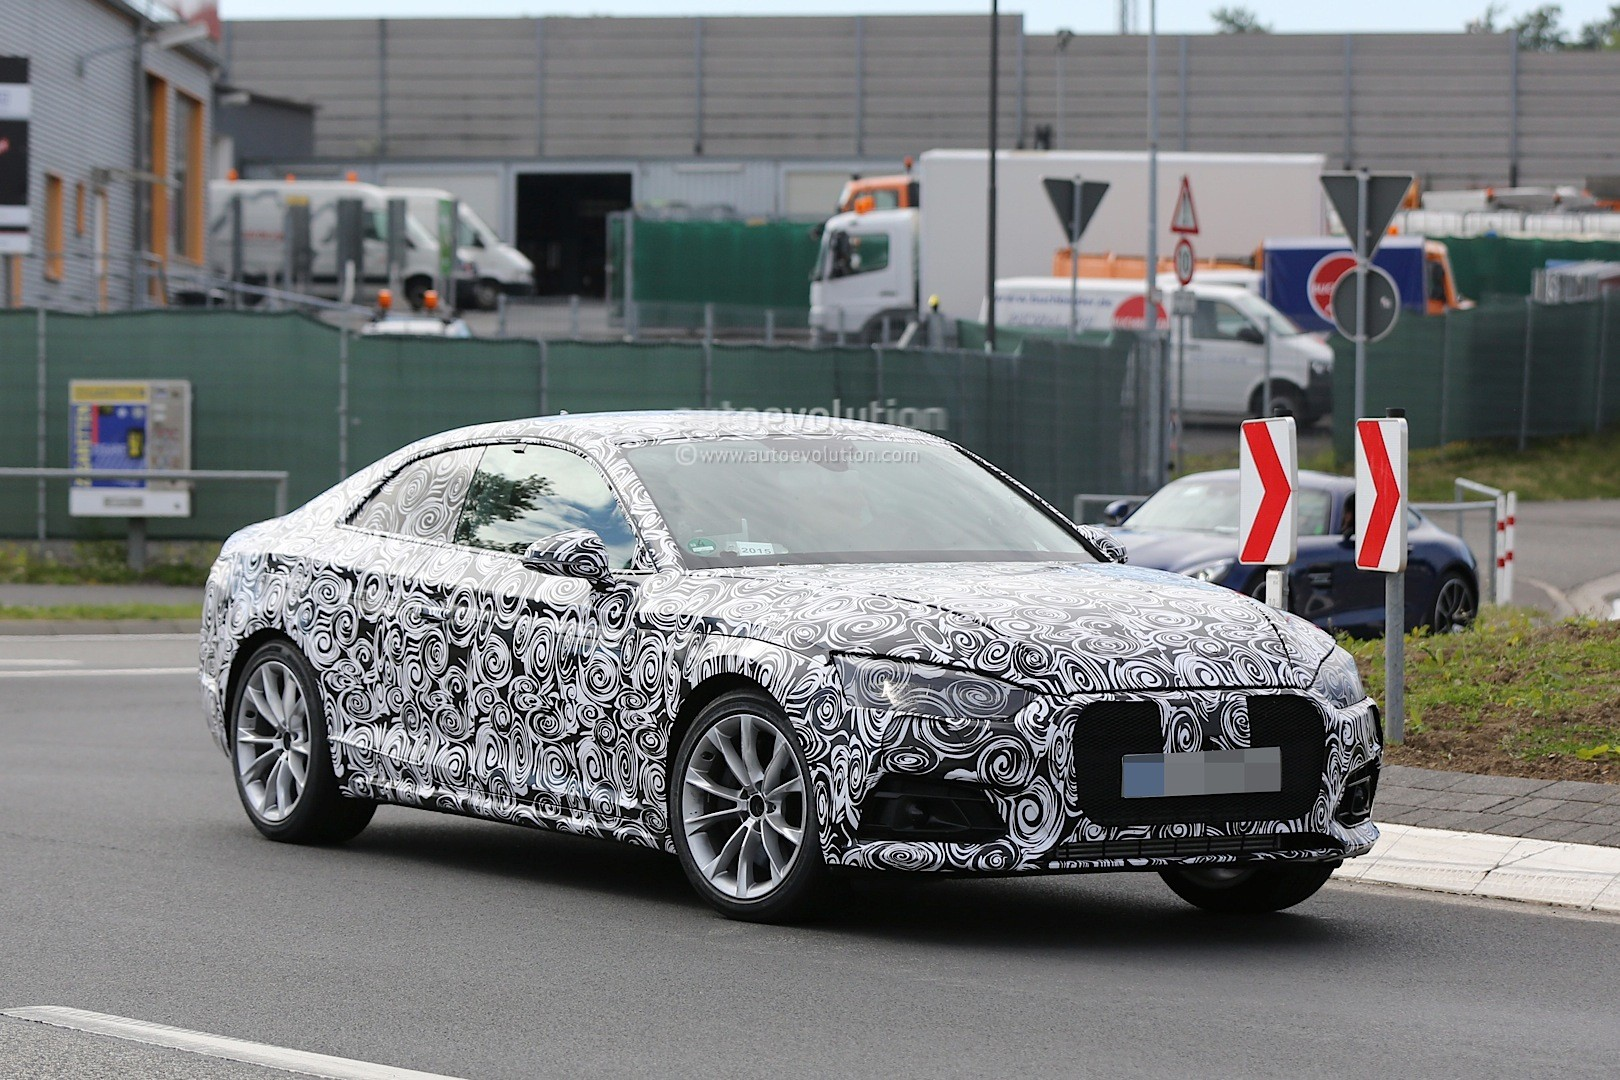 Spyshots: 2017 Audi S5 Performance Coupe First Photos - autoevolution